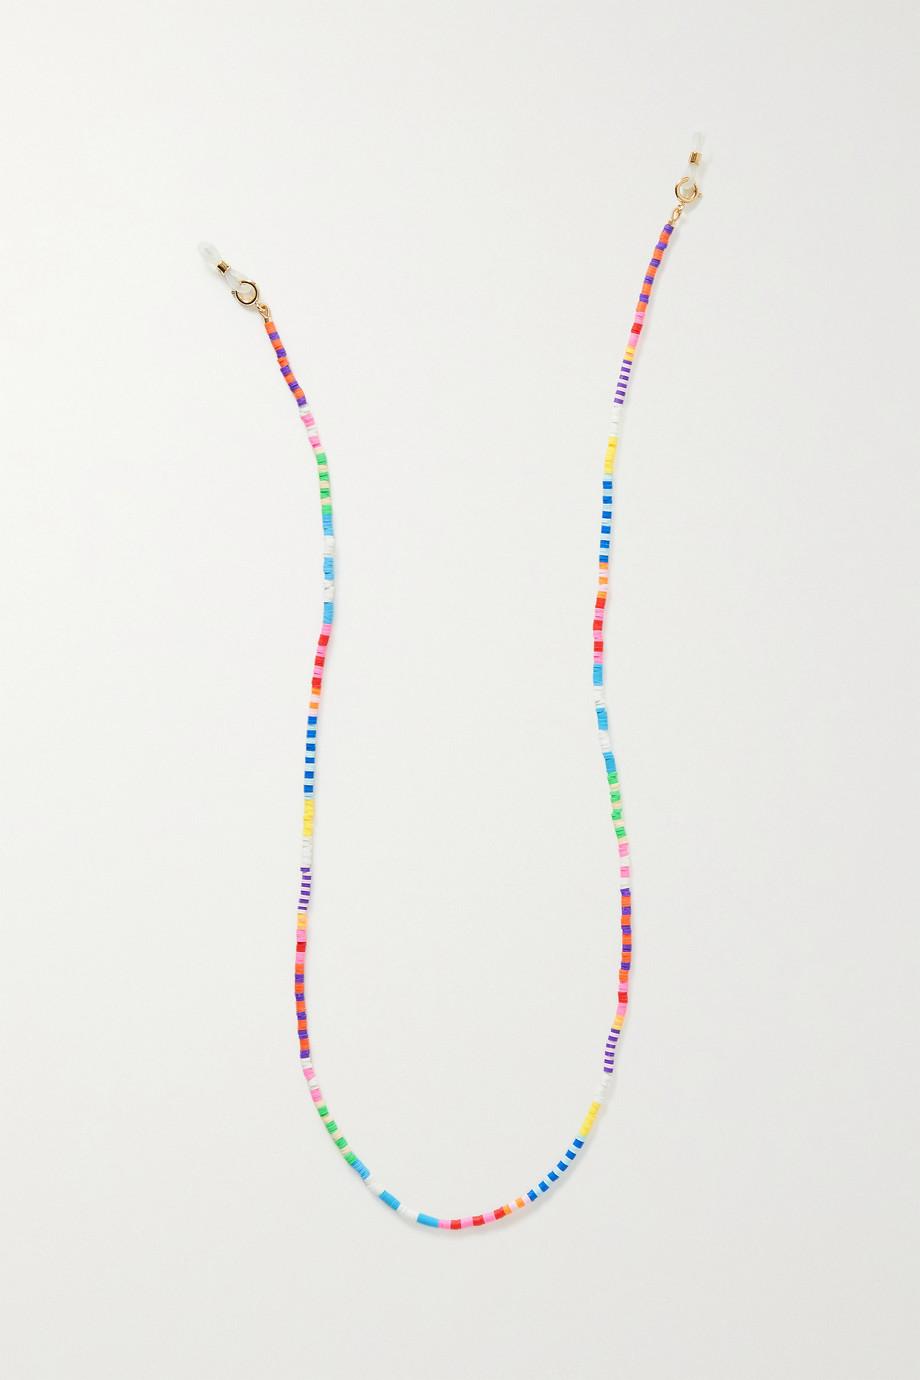 Roxanne Assoulin Technicolor rubber and gold-tone sunglasses chain